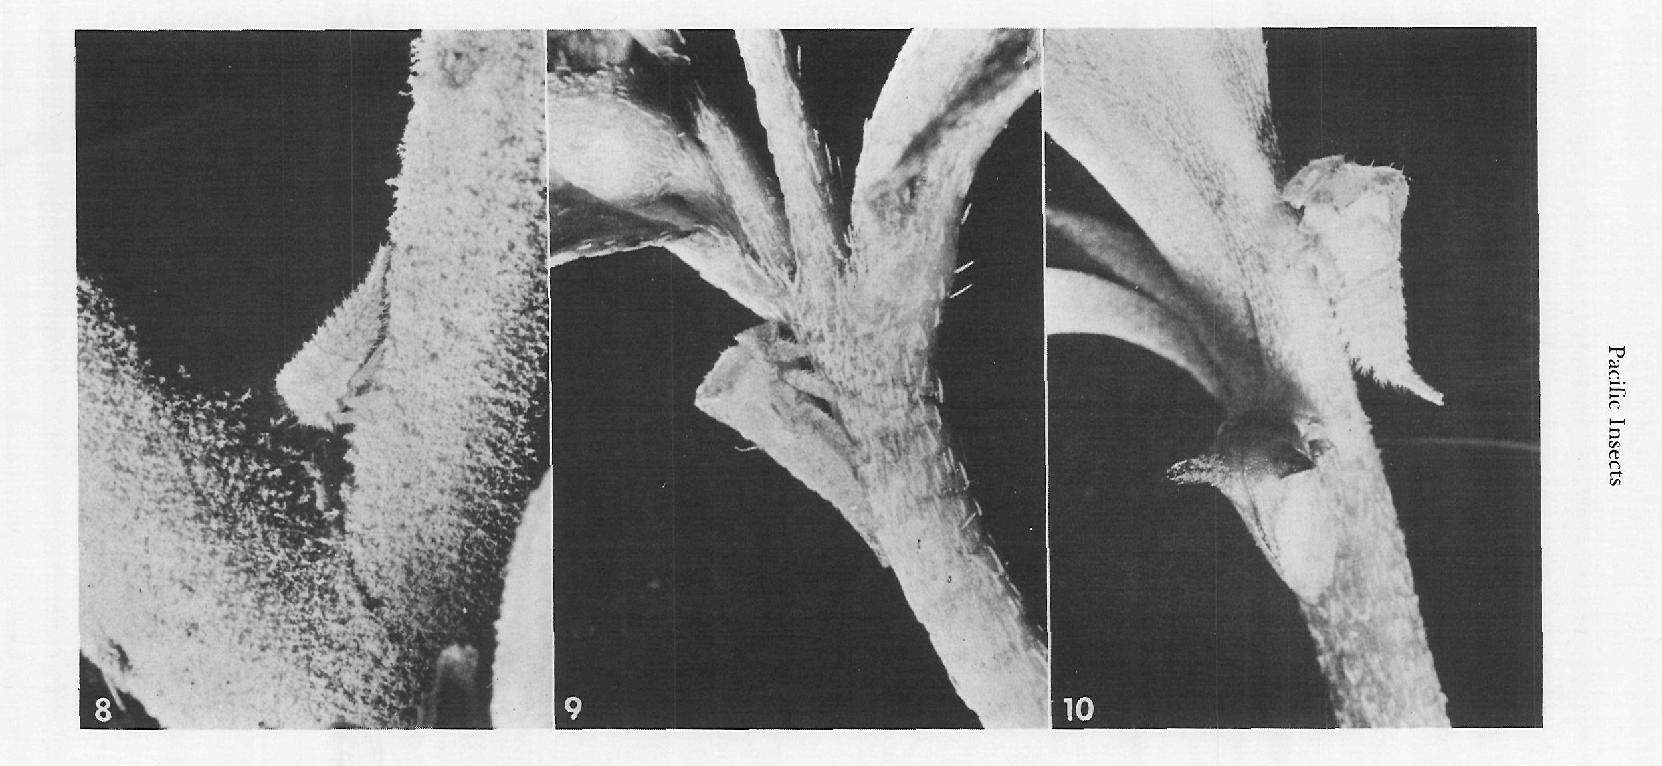 figure 8-10